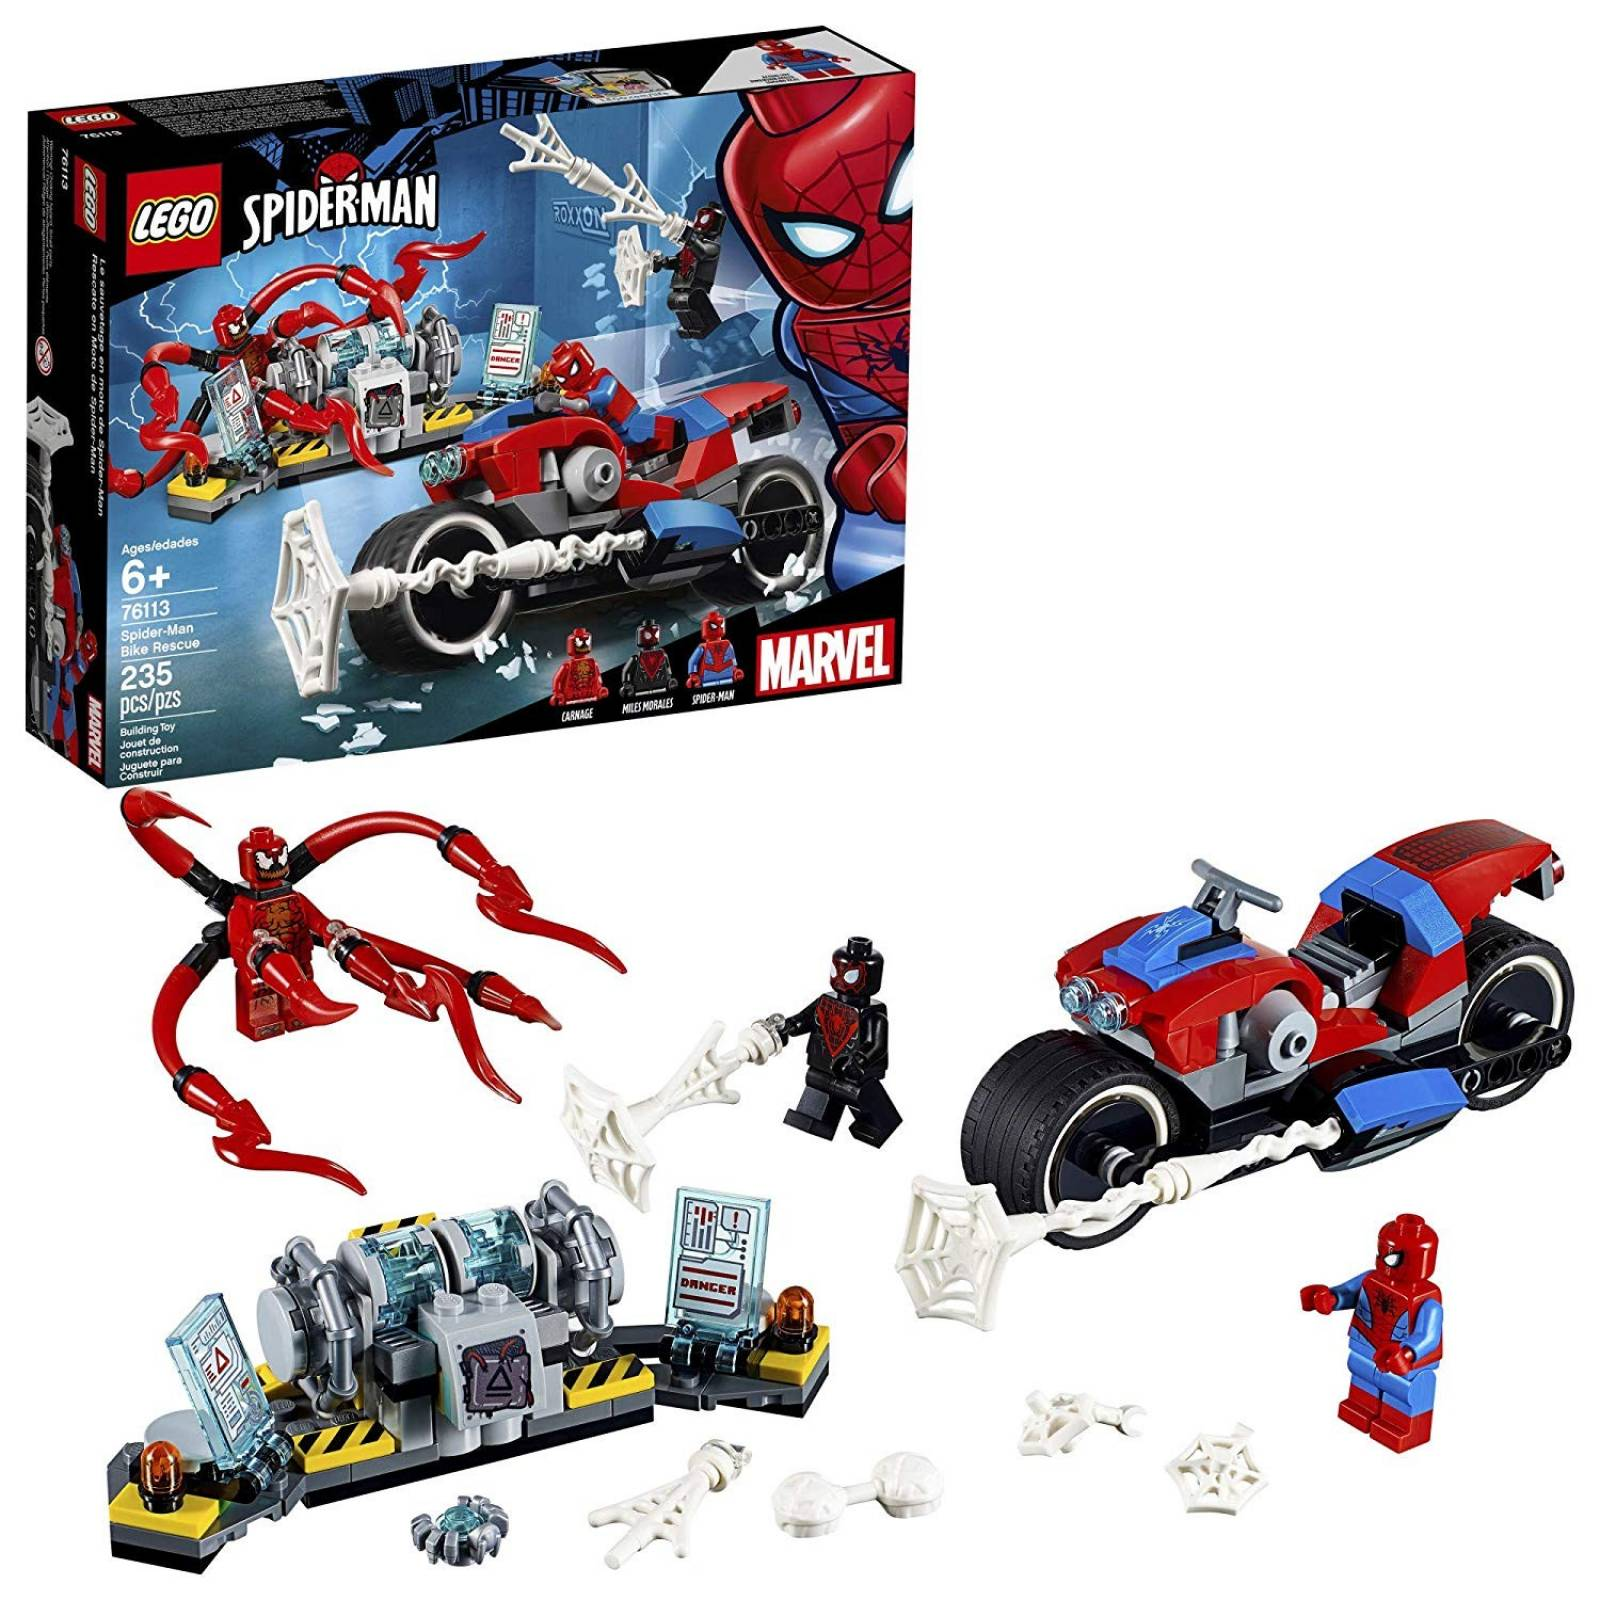 Juguete para construir LEGO 6251072 Spiderman Bike 235pzs